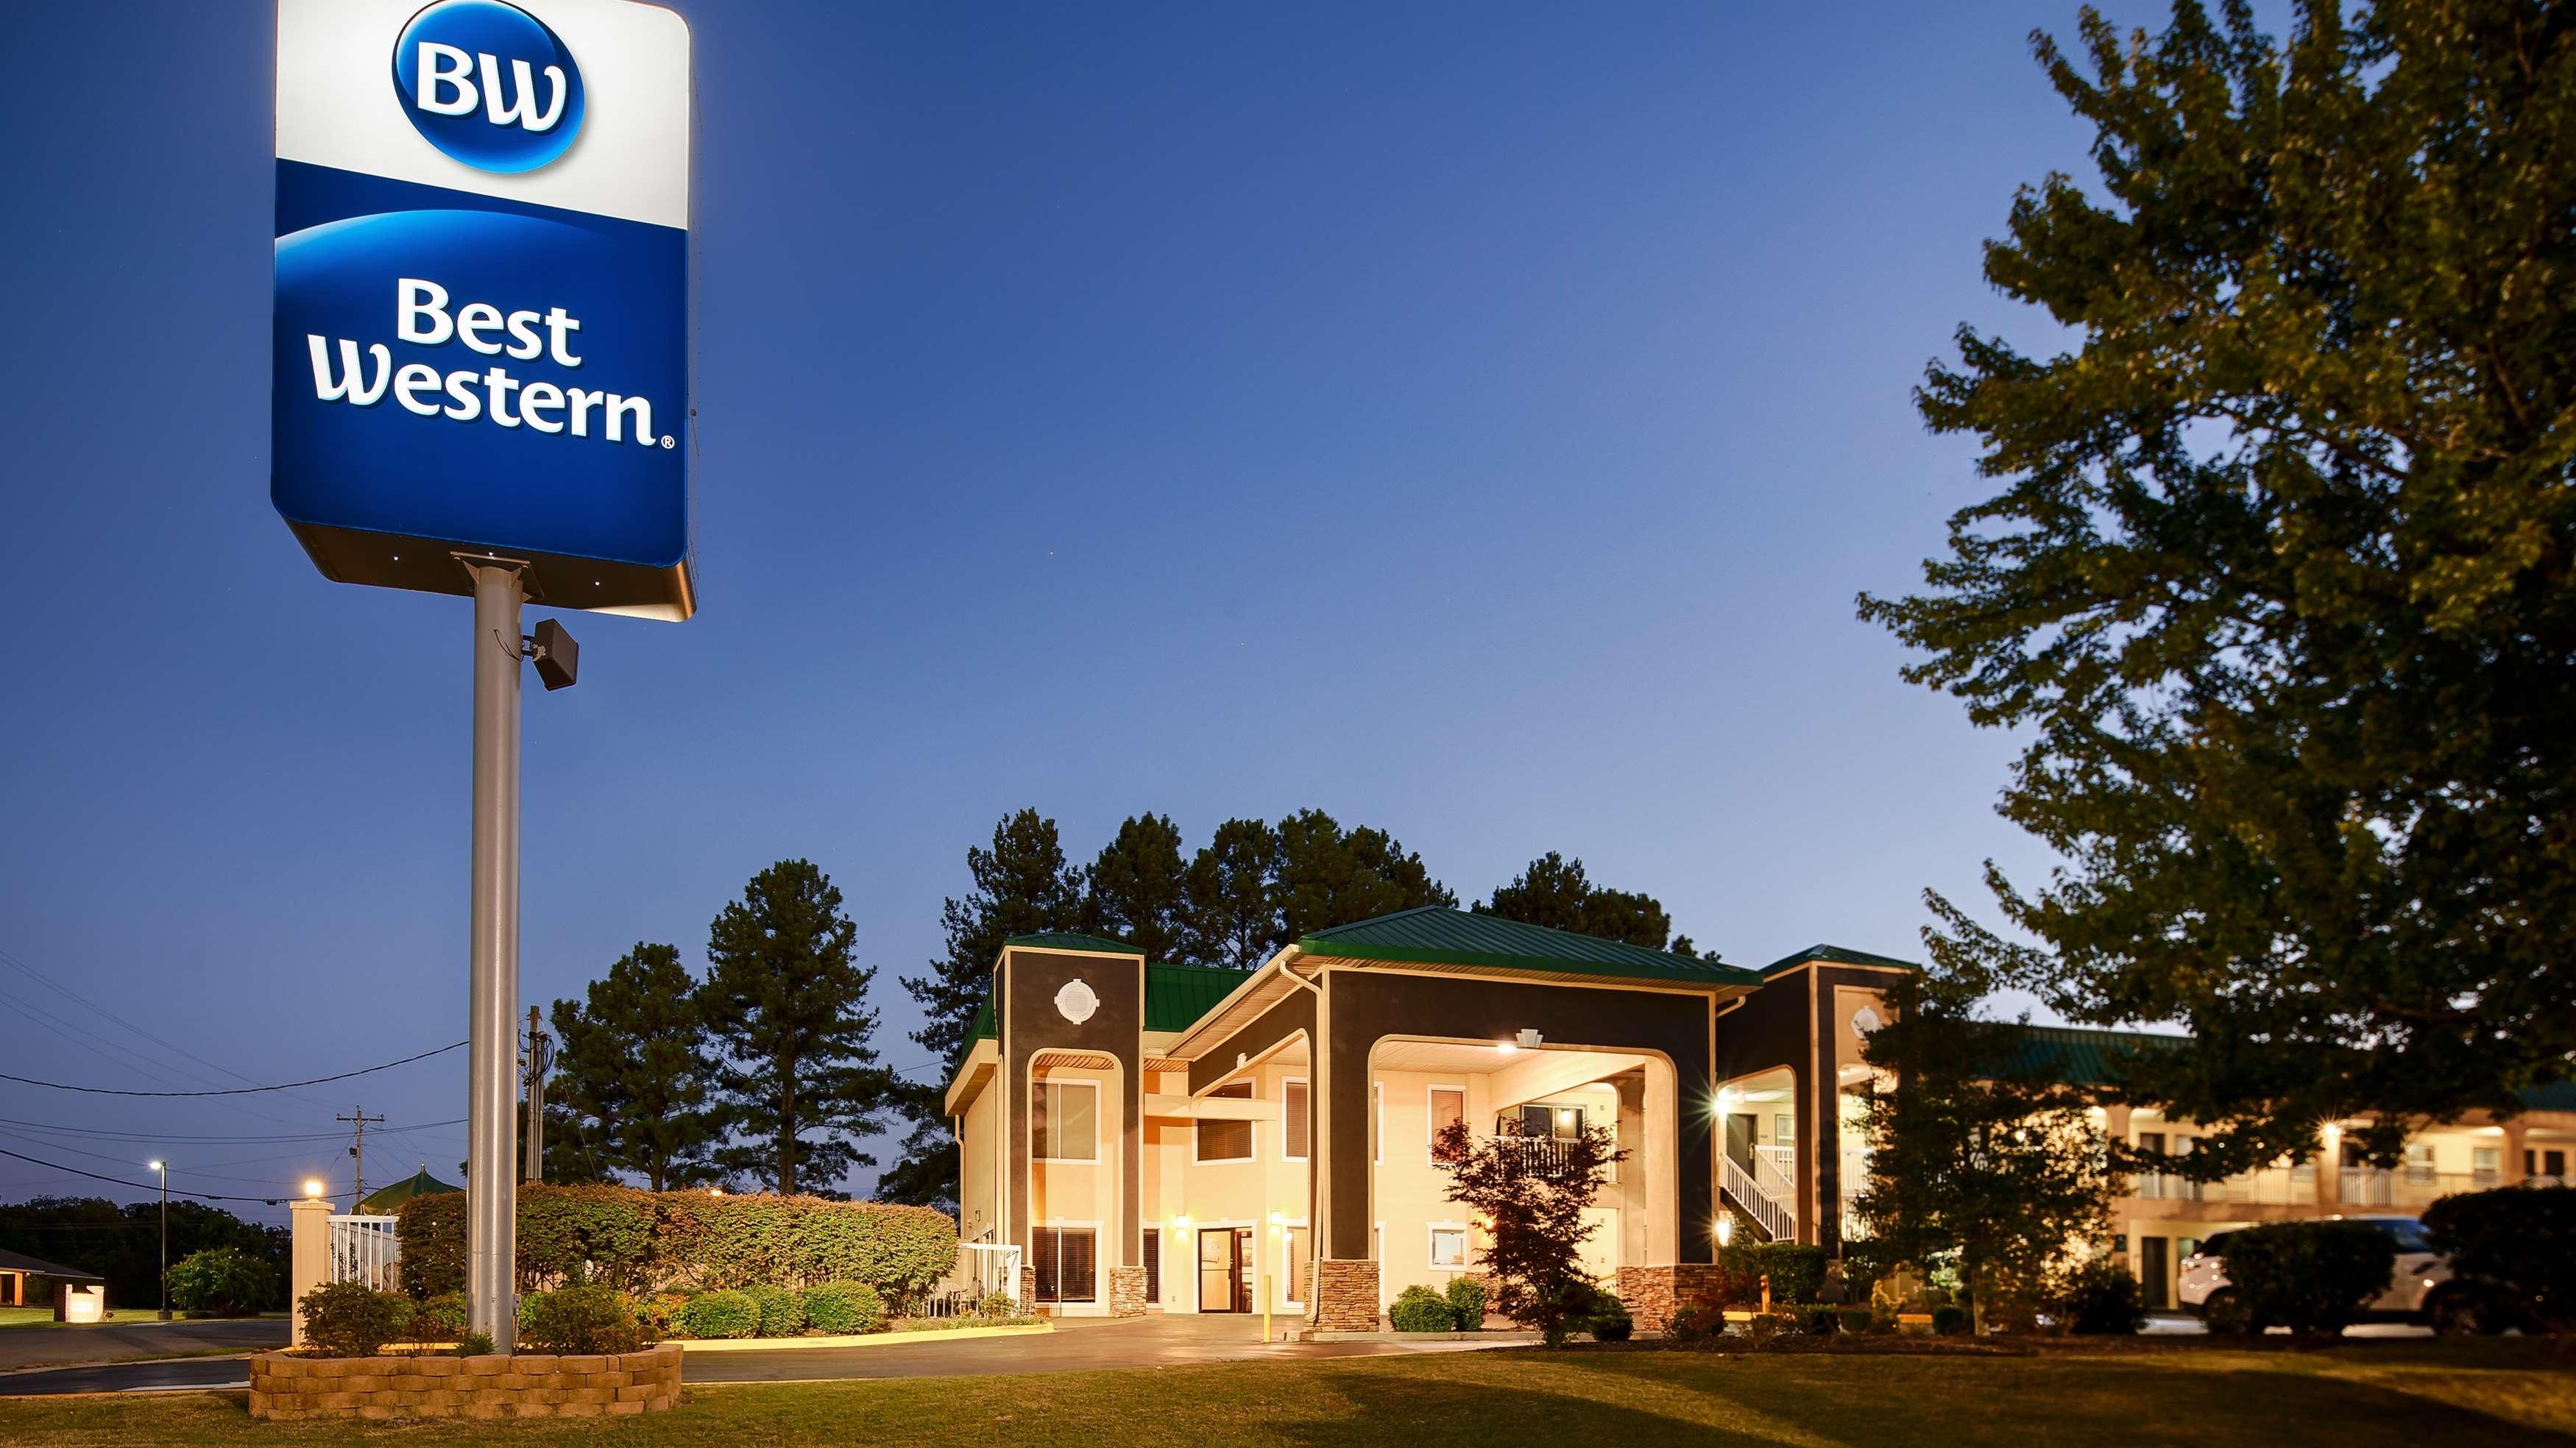 Best Western Fairwinds Inn image 0